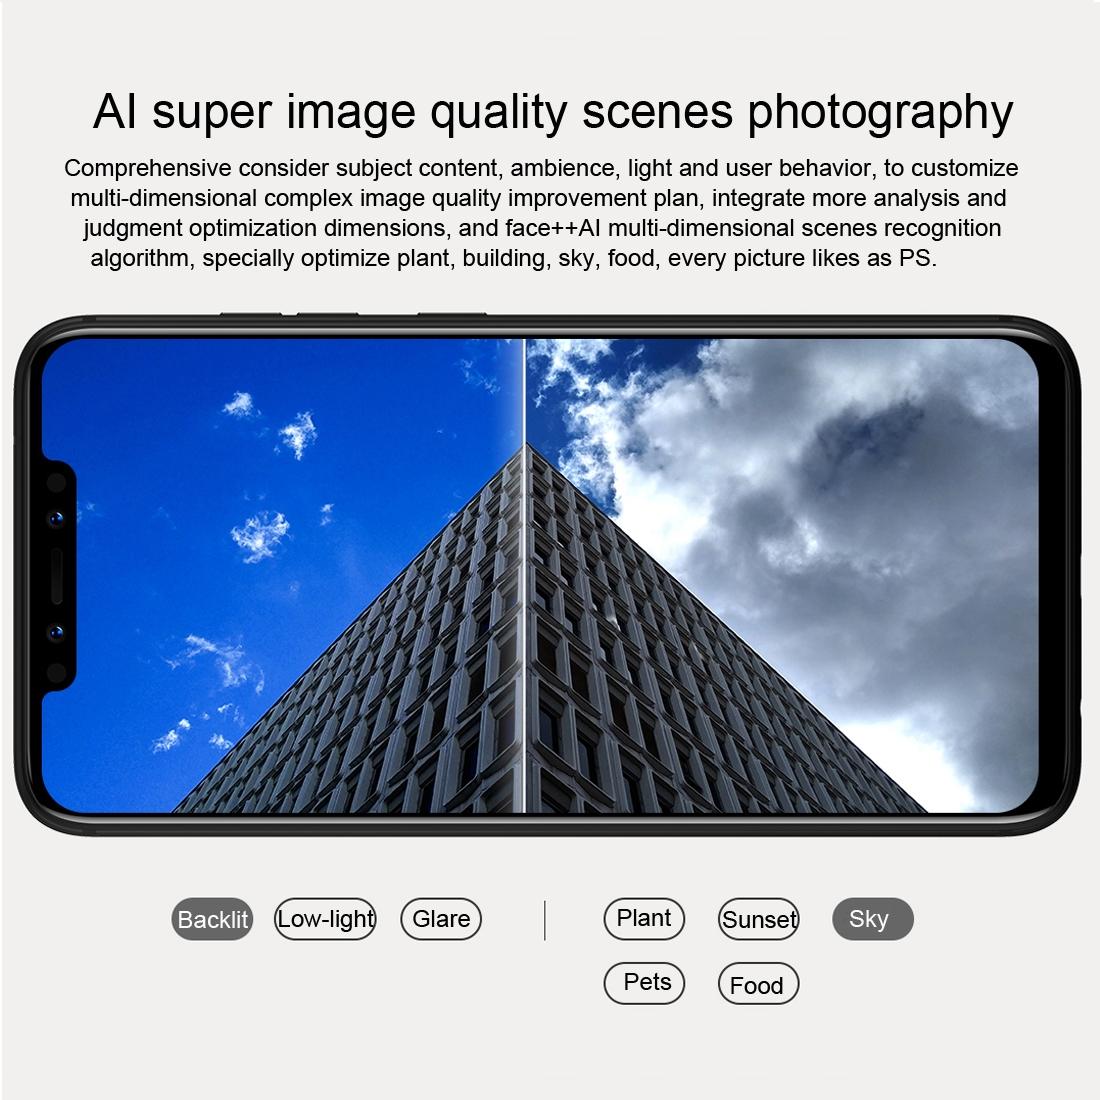 i.ibb.co/61t8CV1/Smartphone-Celular-6-GB-RAM-64-GB-ROM-Lenovo-S5-Pro-11.jpg